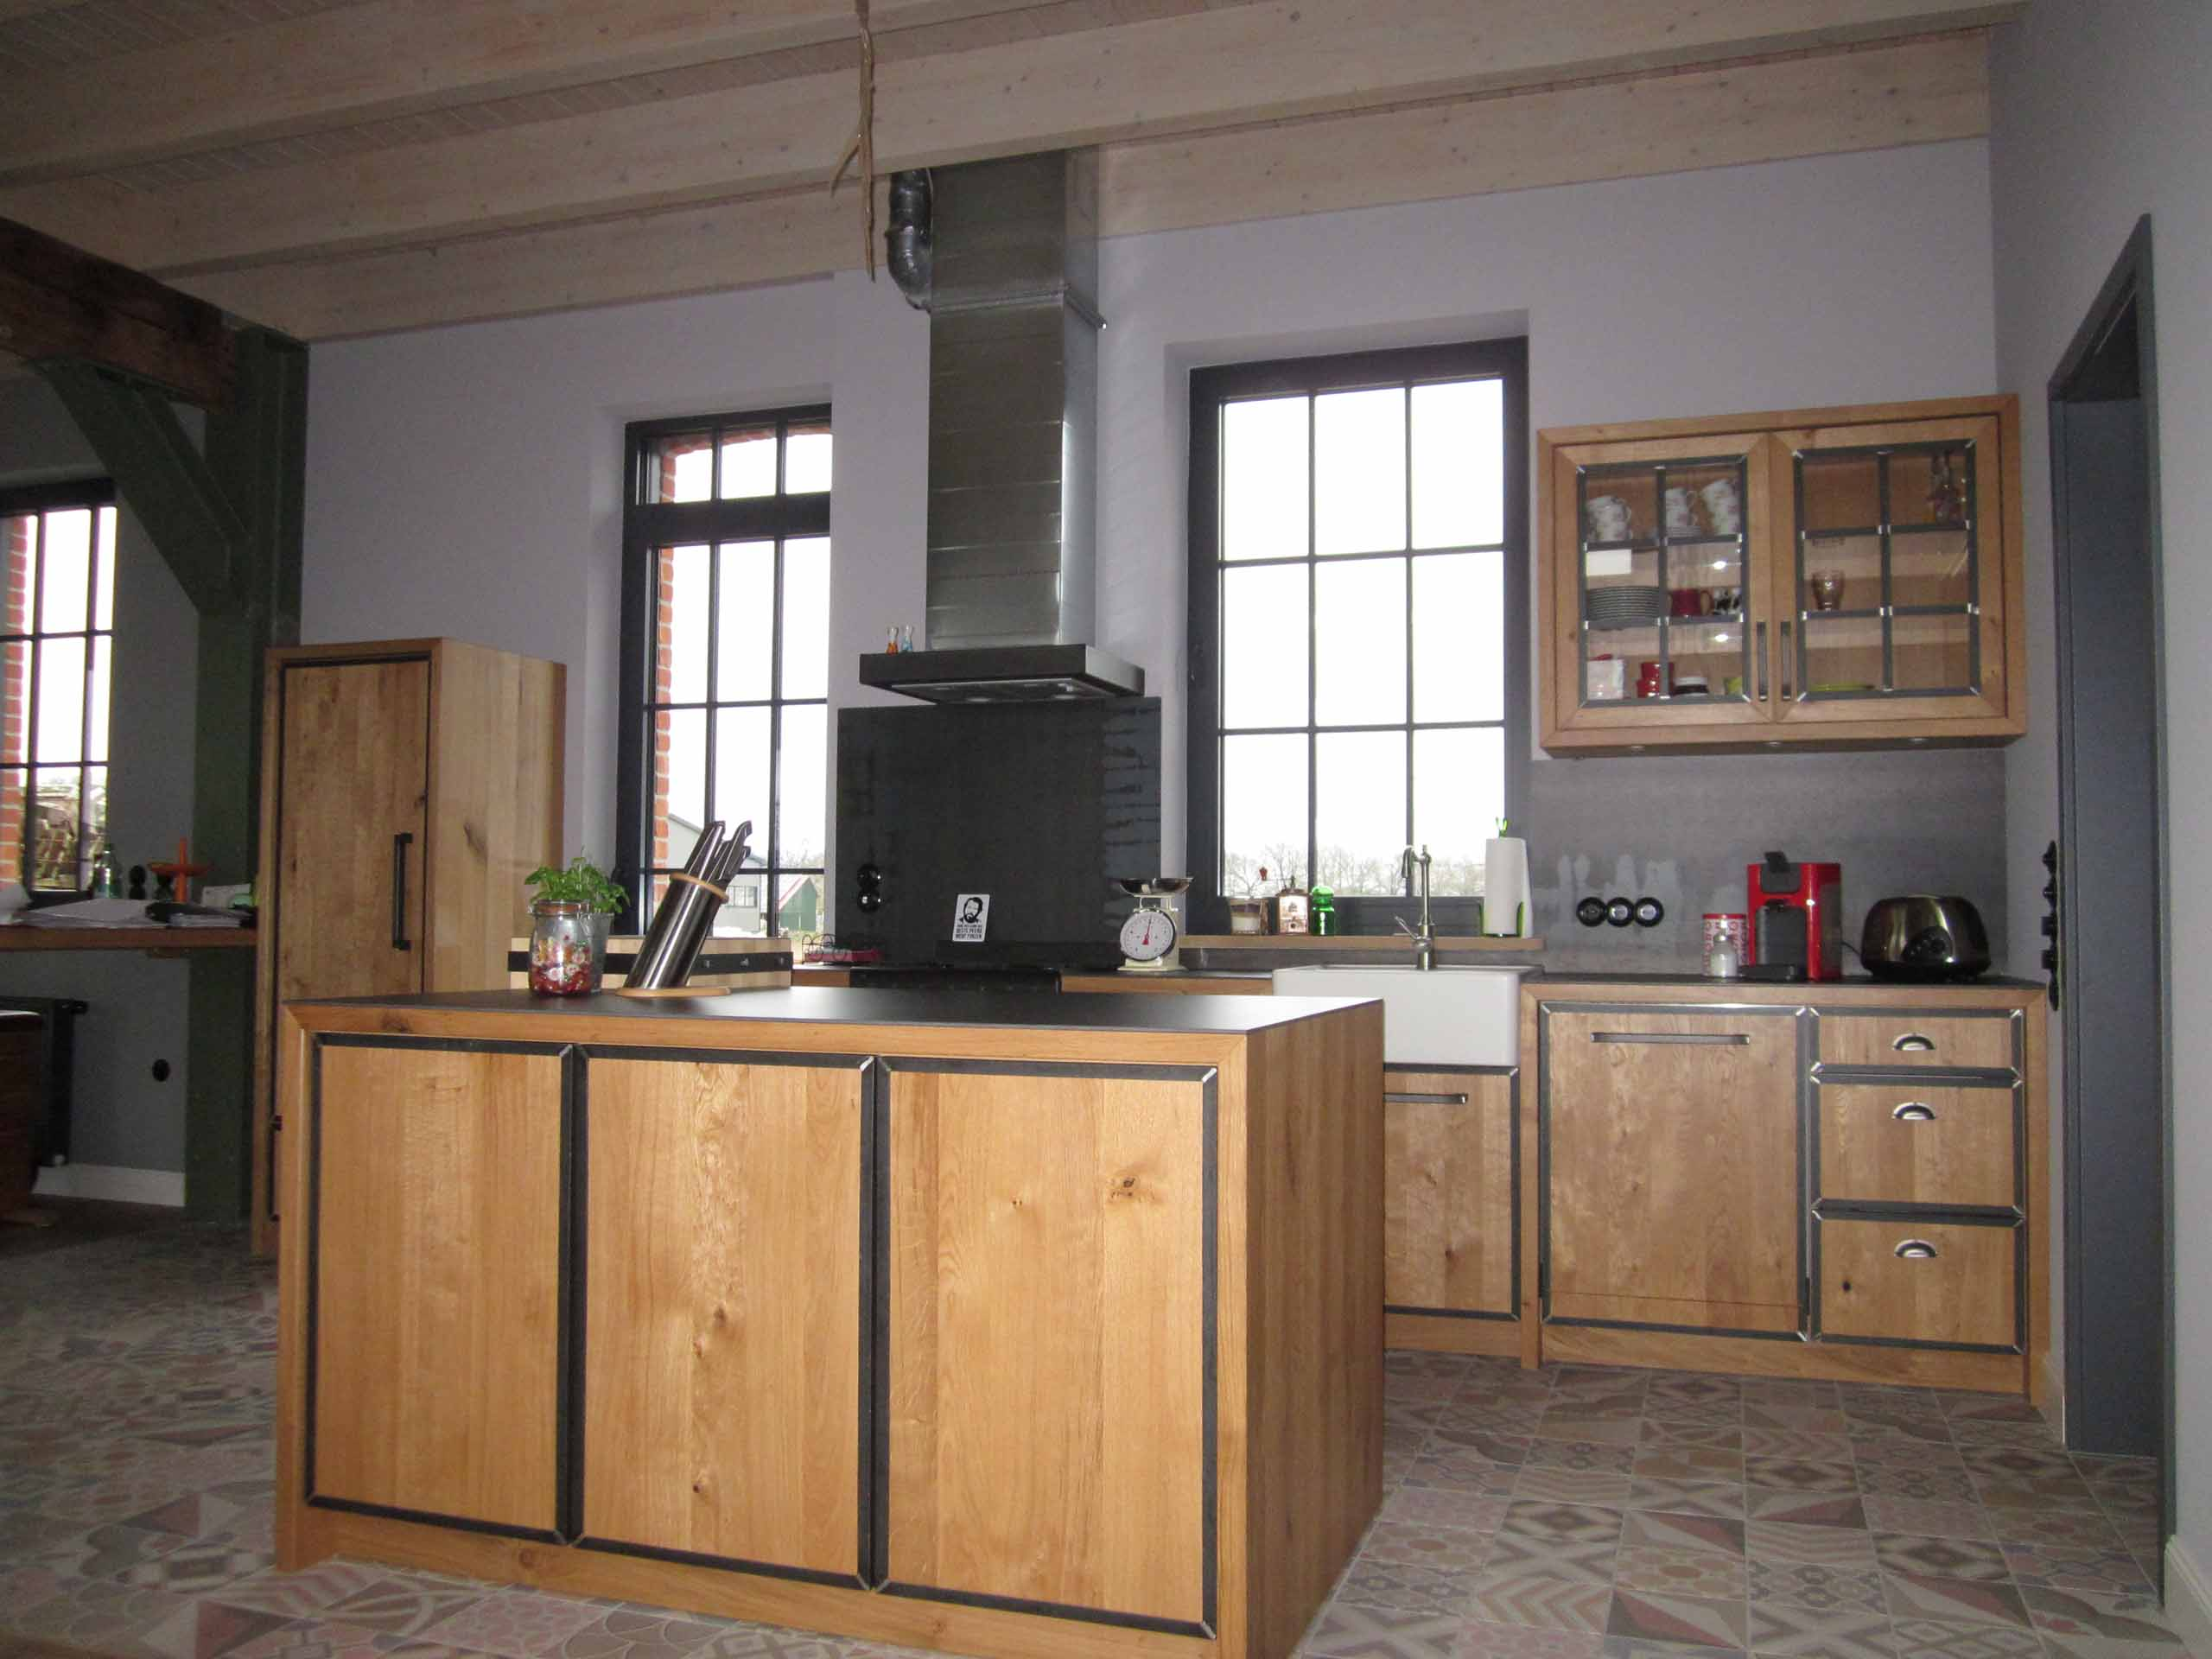 Industrielook Küche - Tischlerei Funke